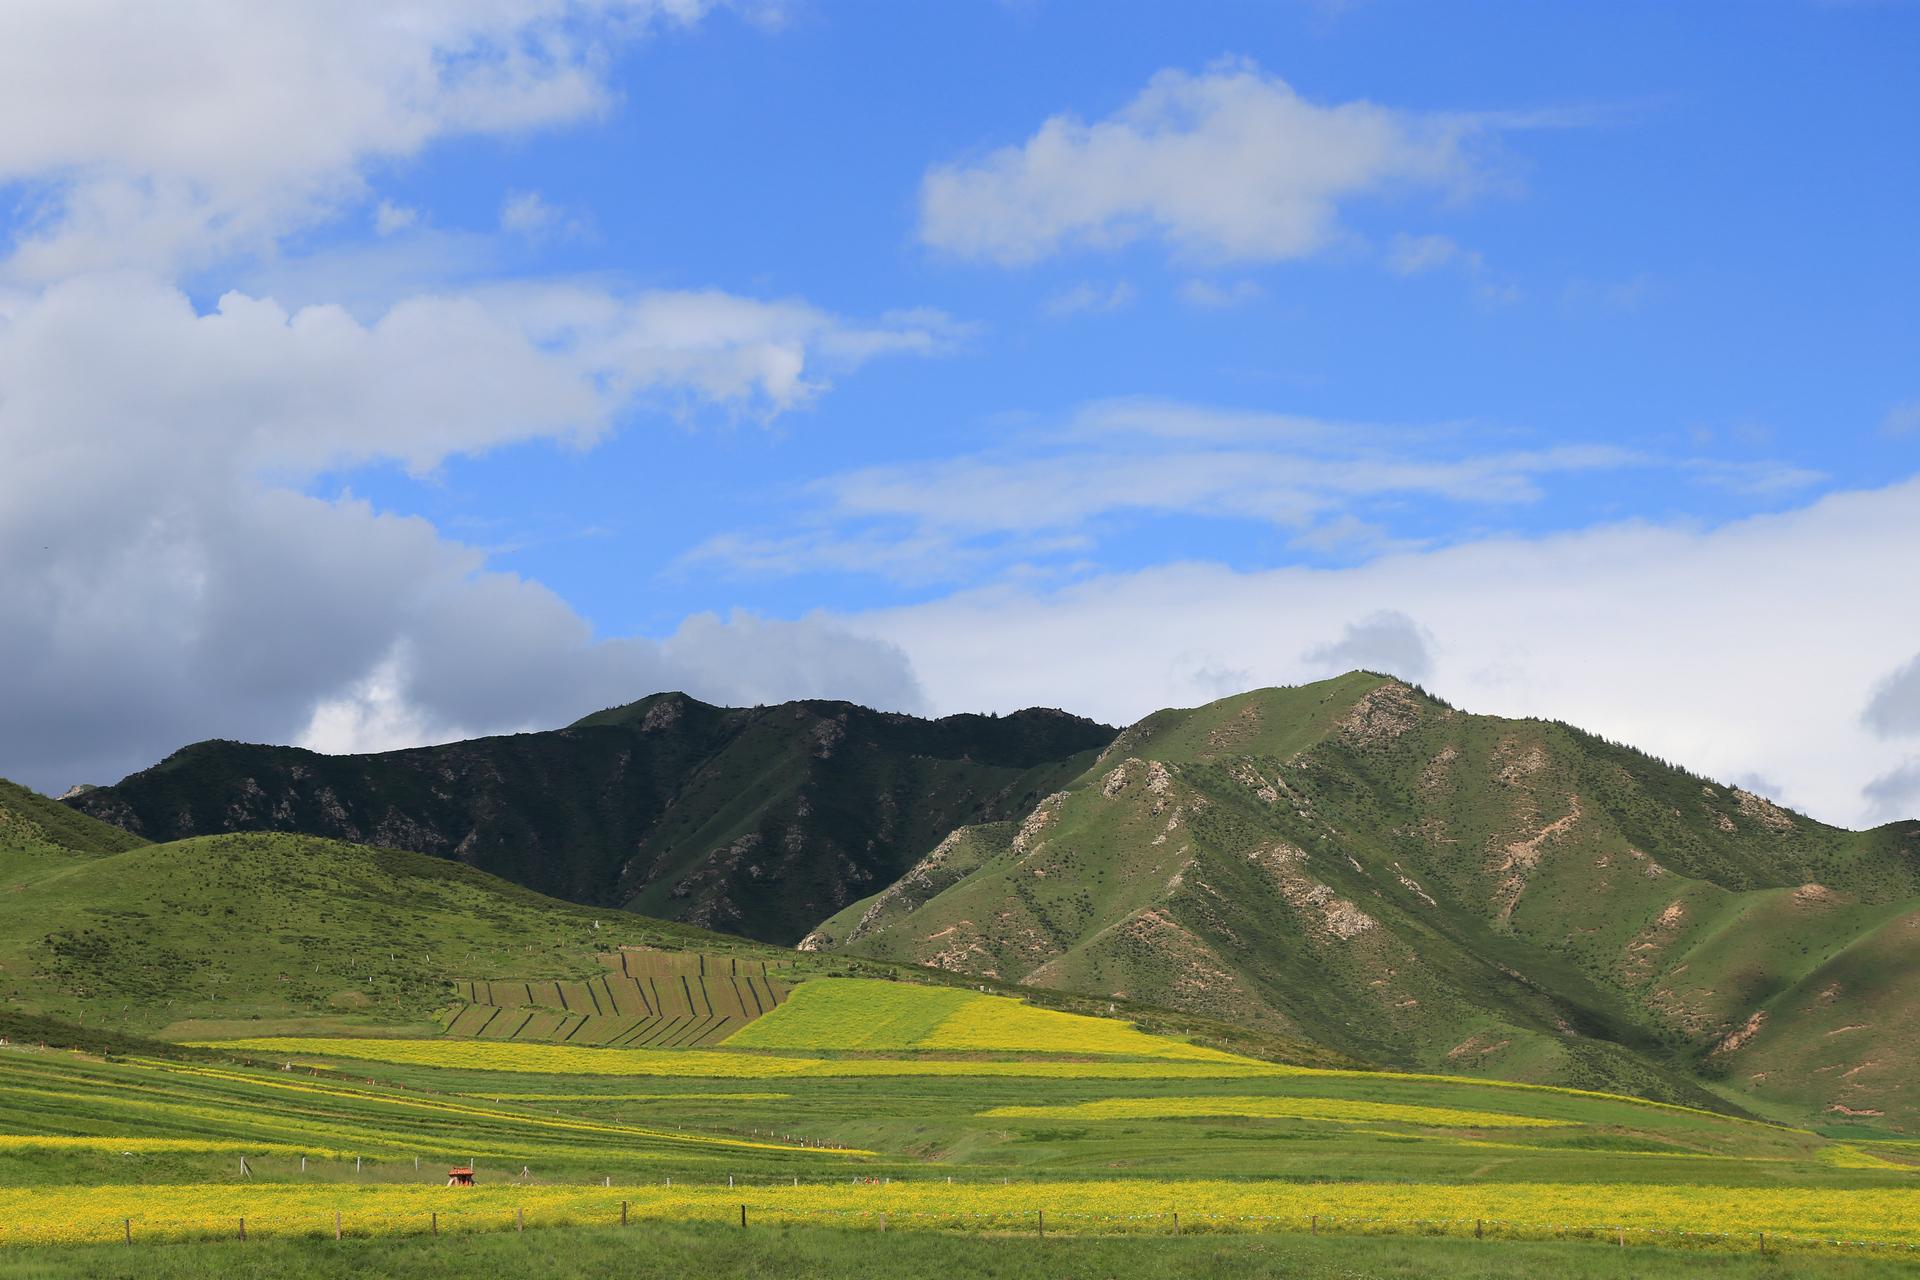 Gansu BianDuKou